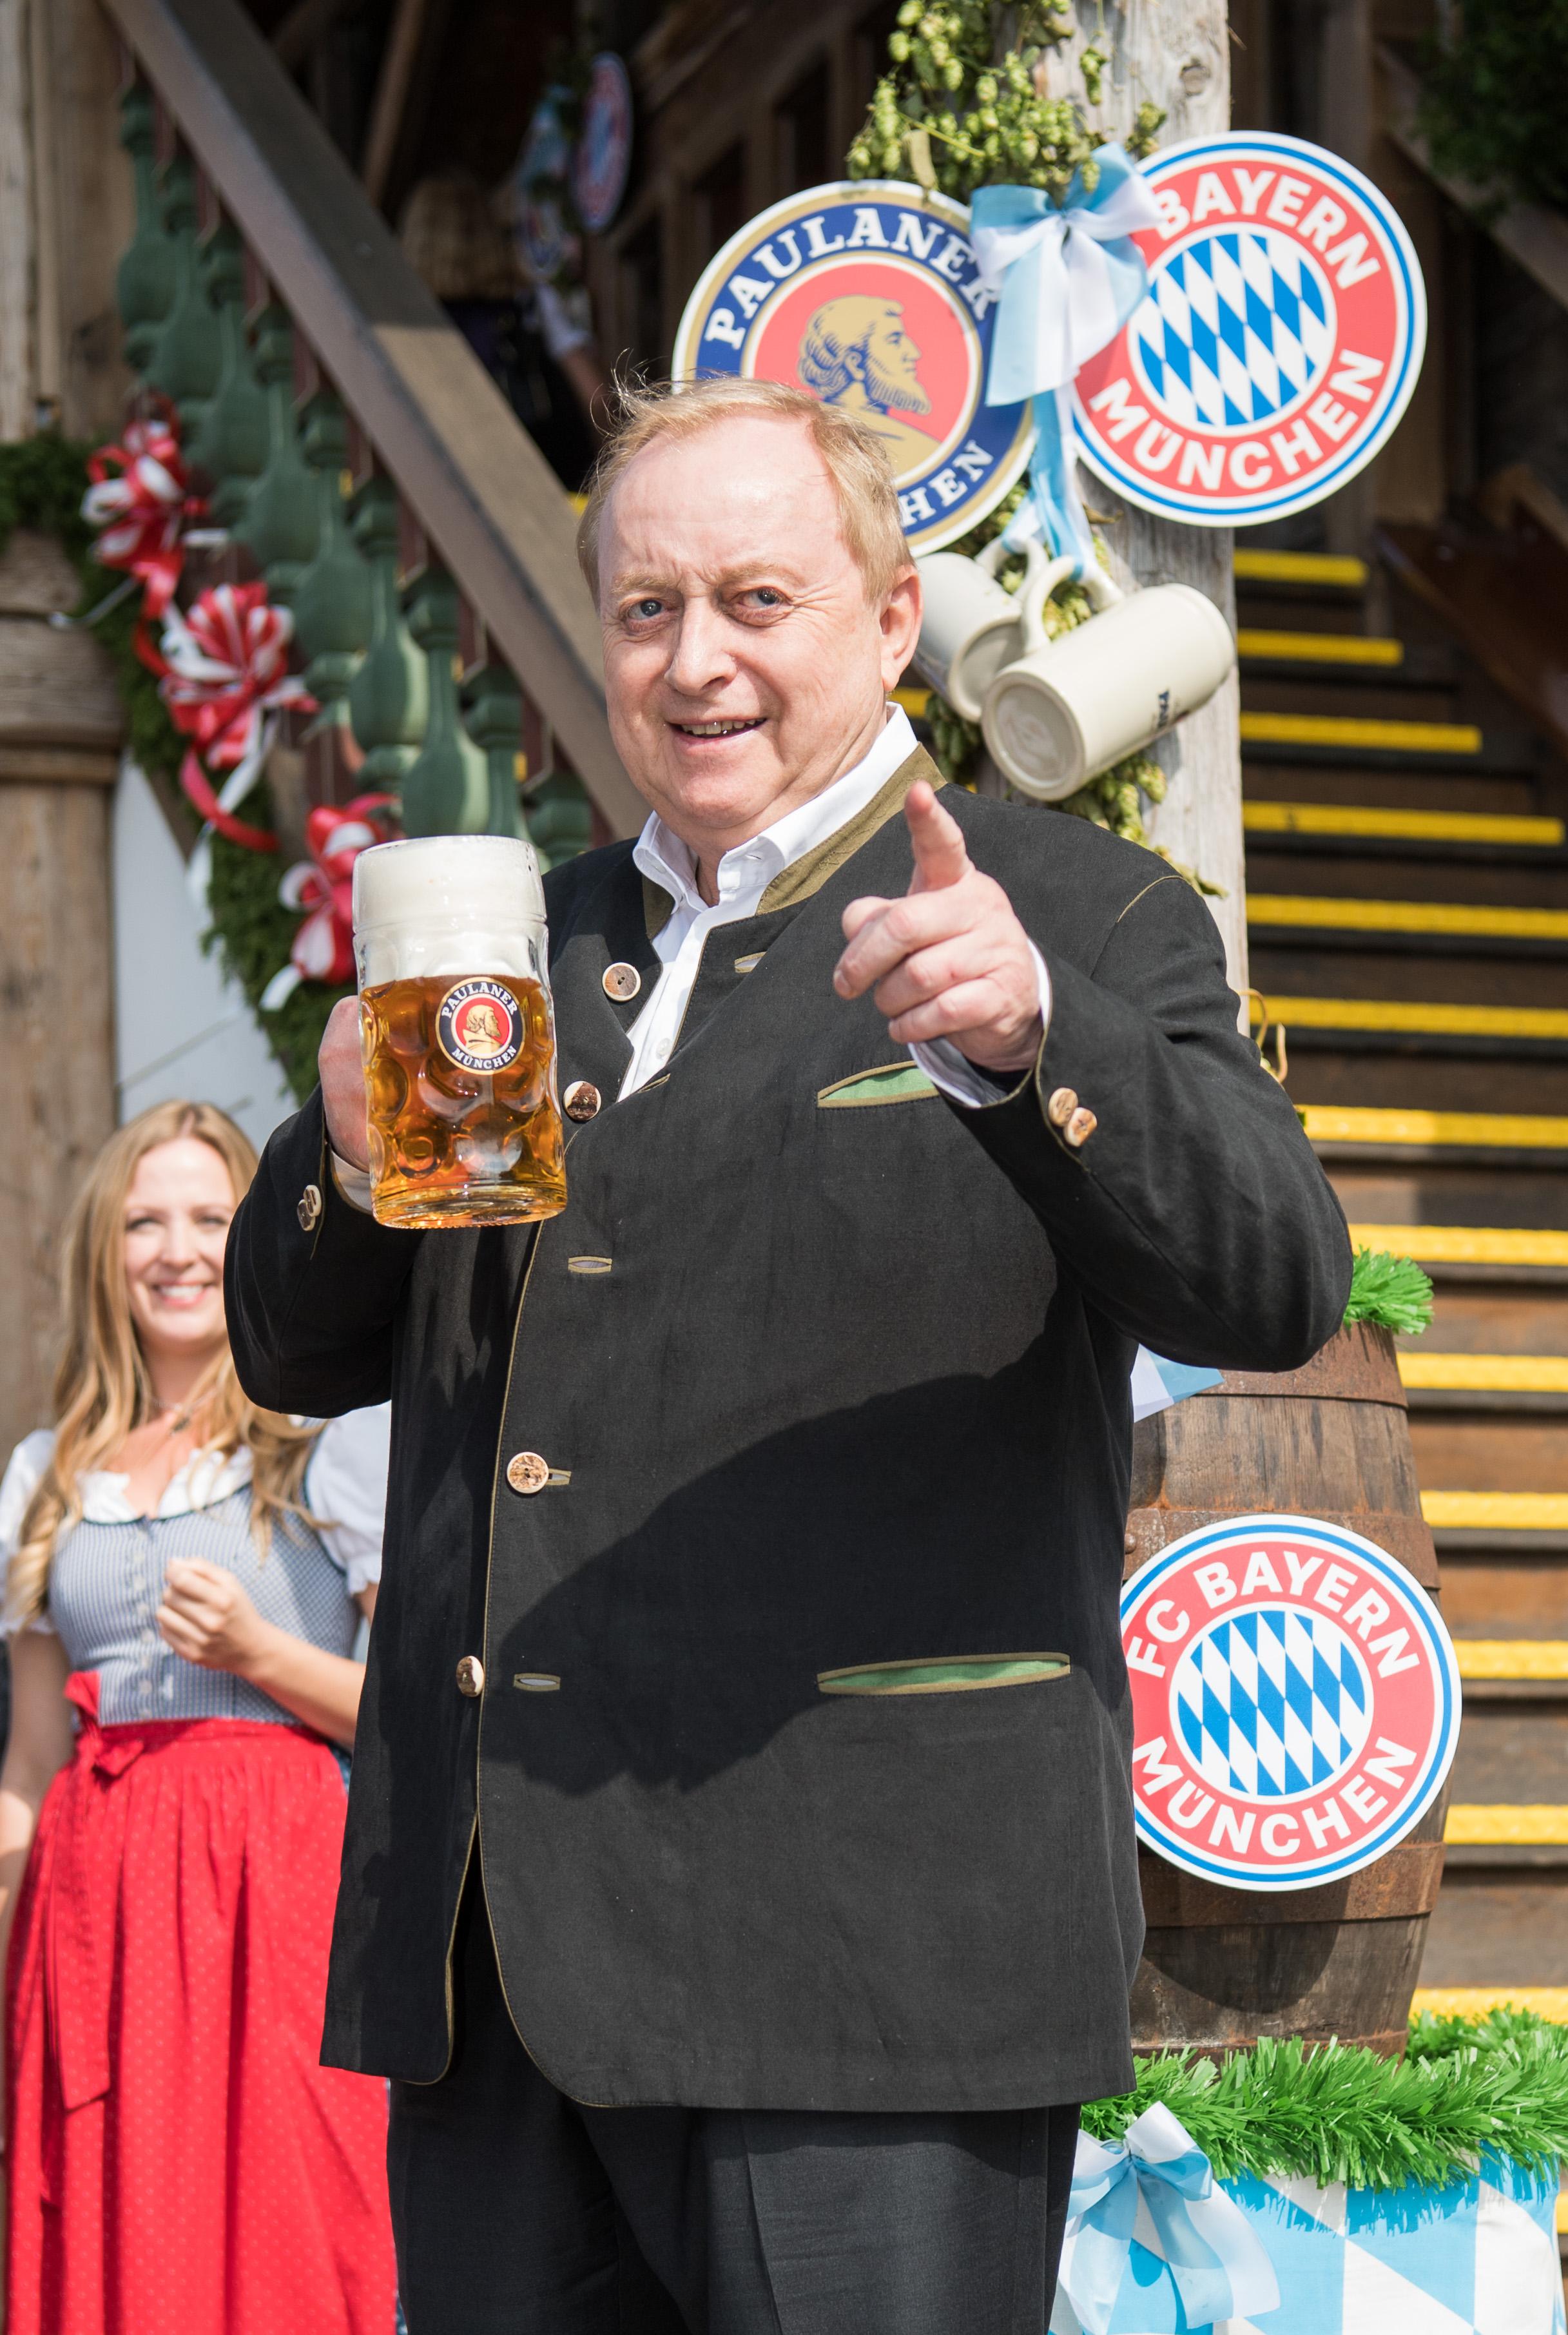 FC Bayern Muenchen Attends Oktoberfest 2017